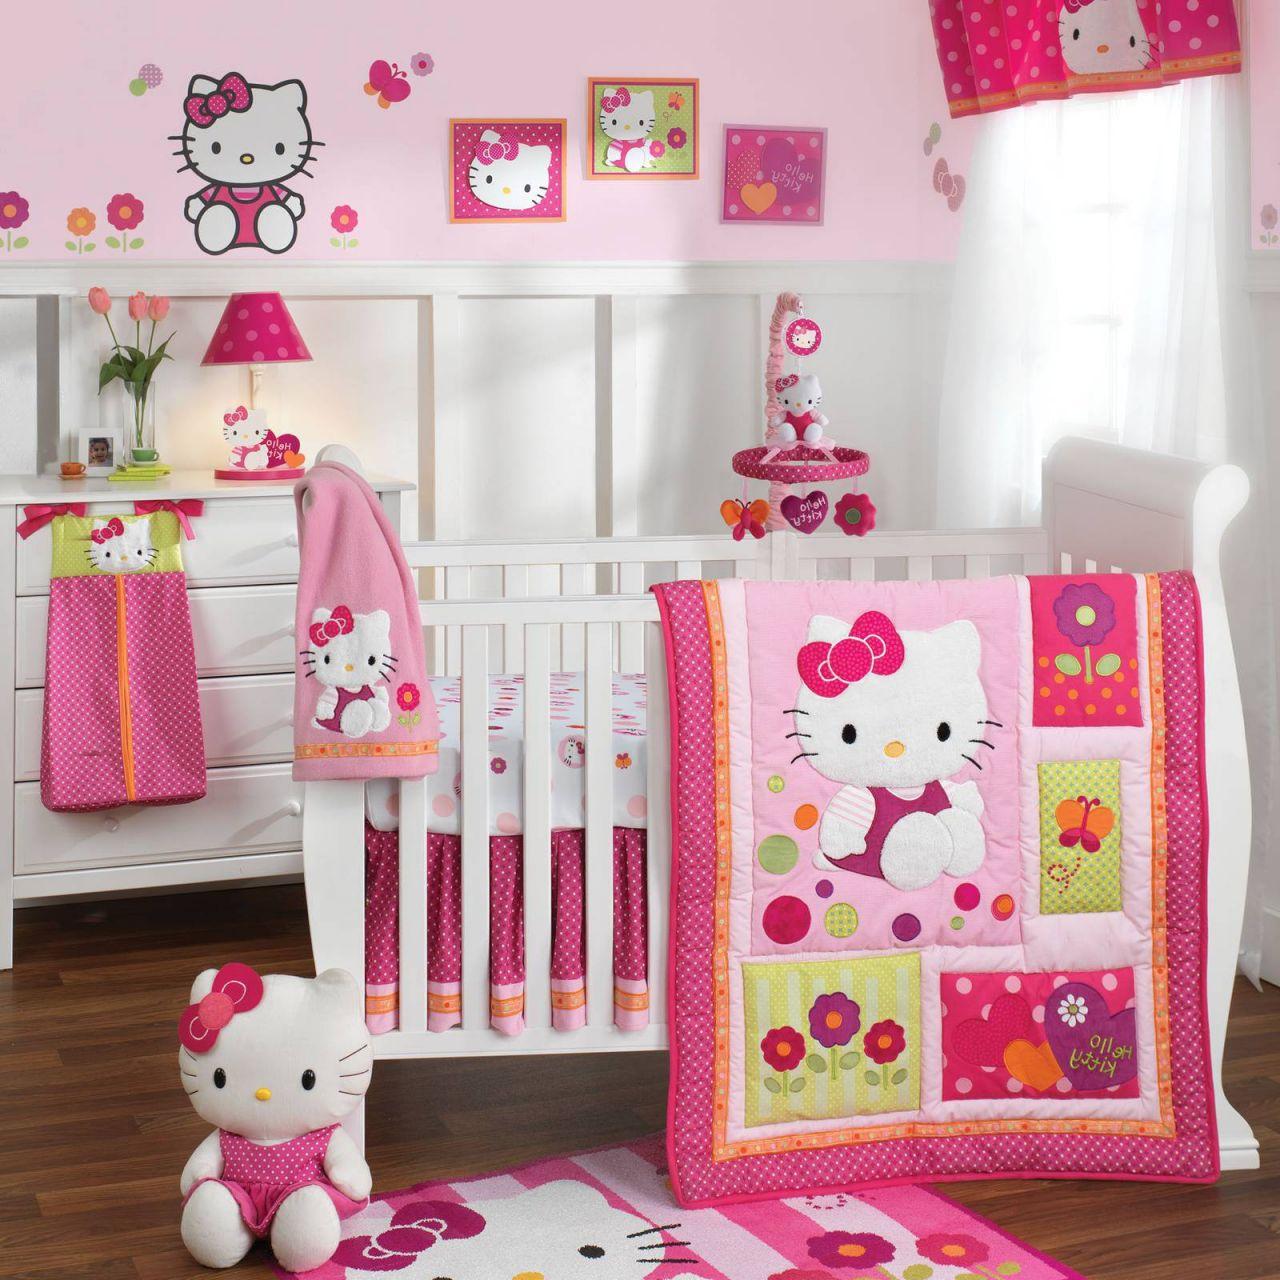 quarto de bebe helo kitty